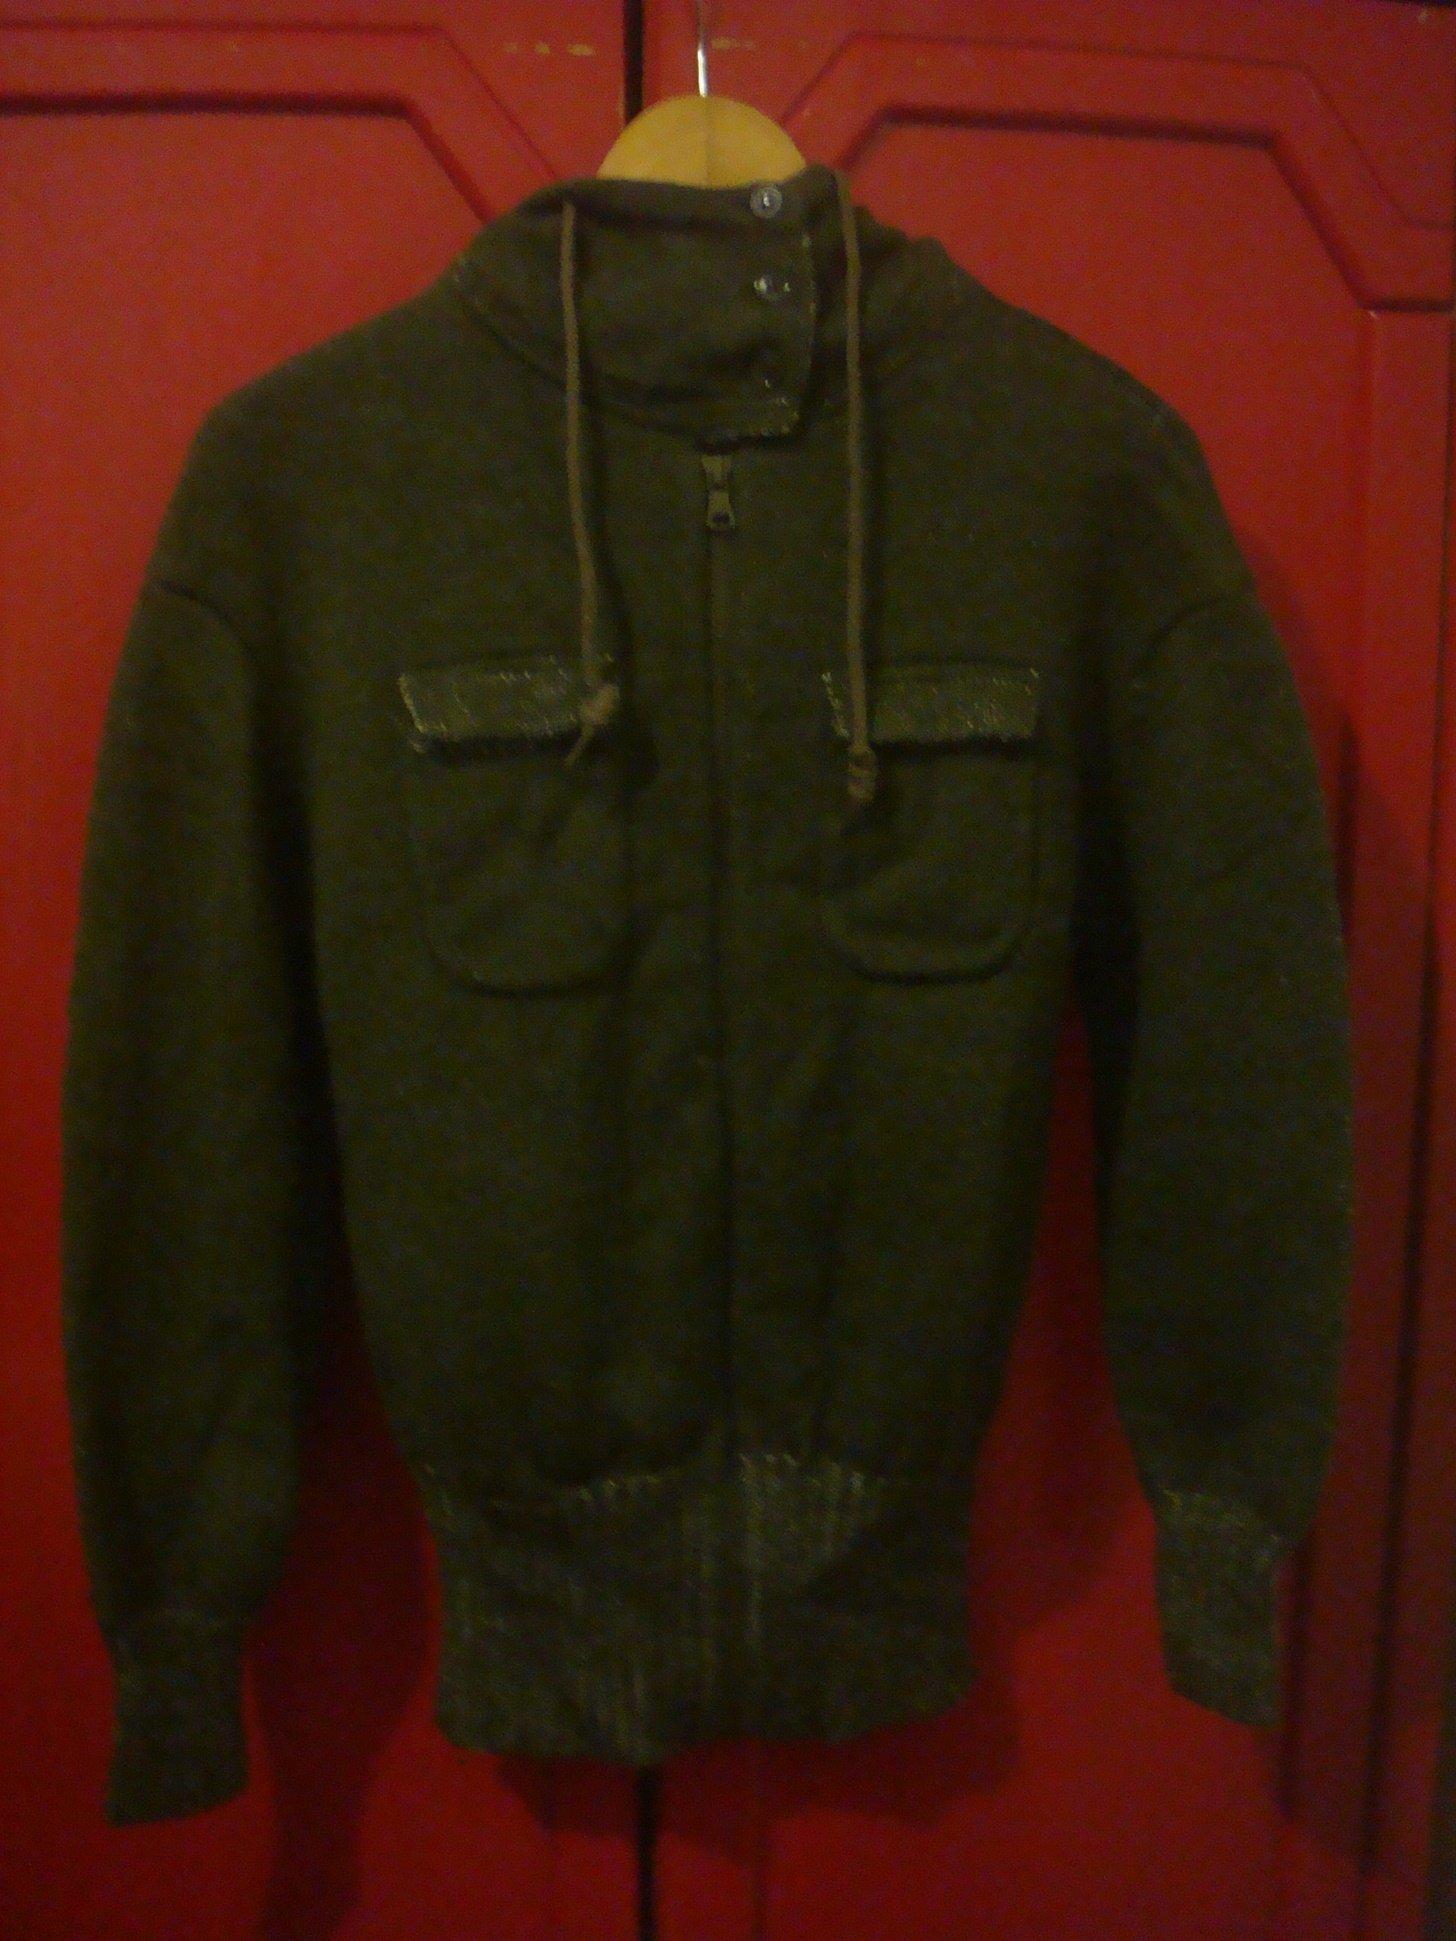 POLO Jeans co 軍綠 針織 連帽 拉鍊 外套 S號 香港製